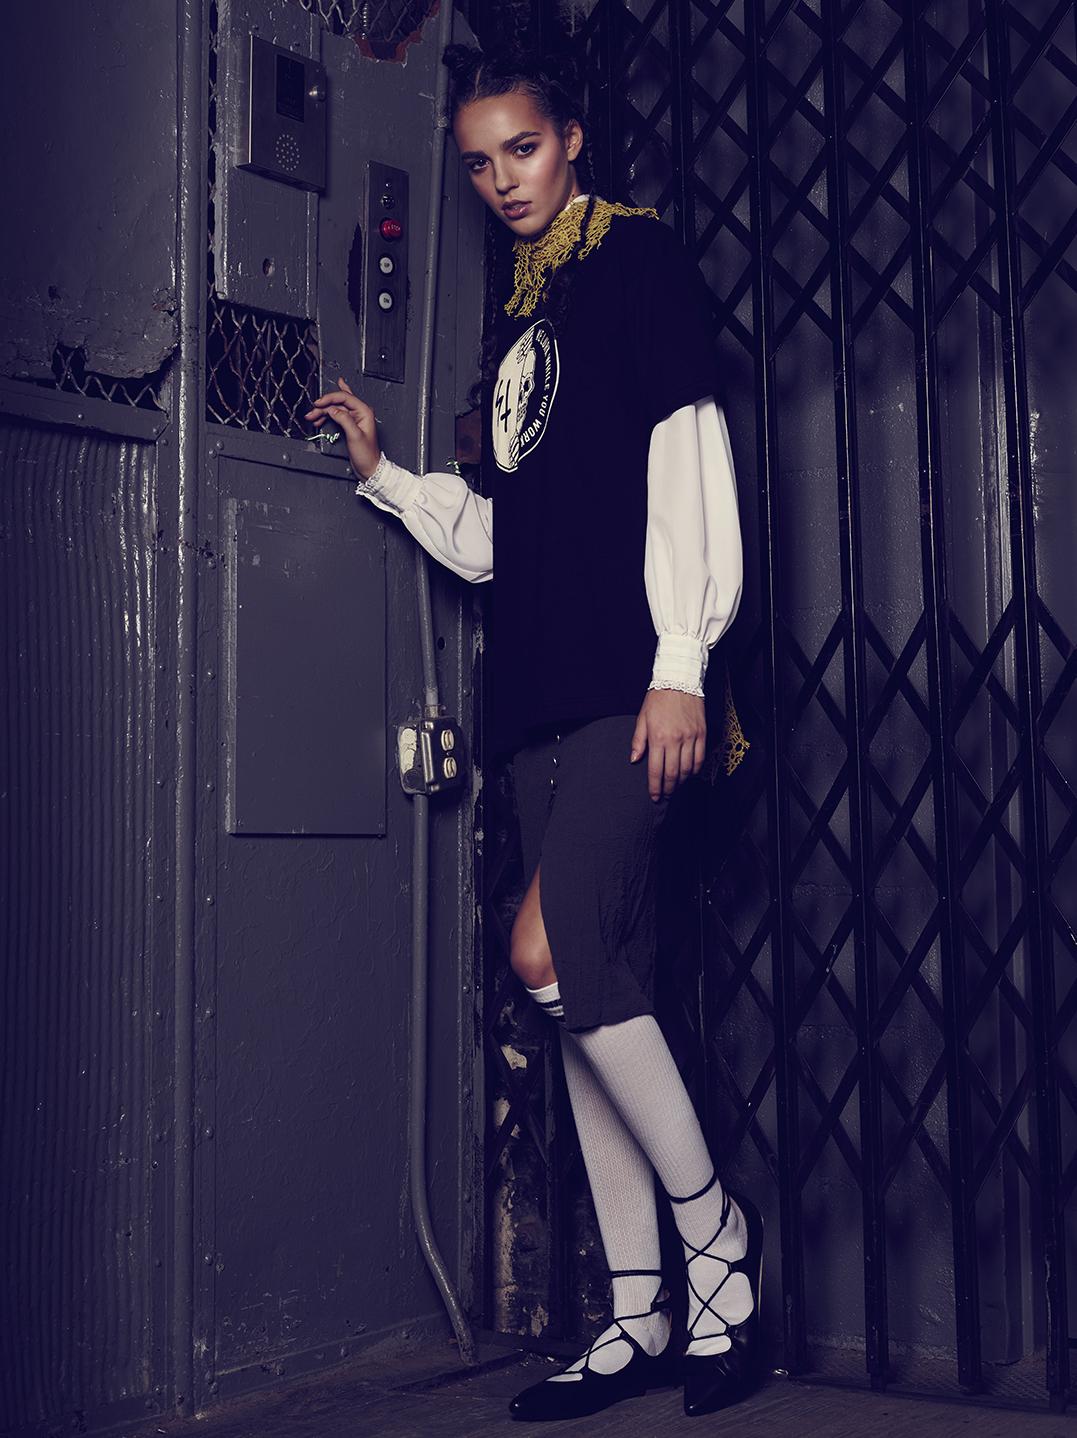 Nyc Street Fashion Women